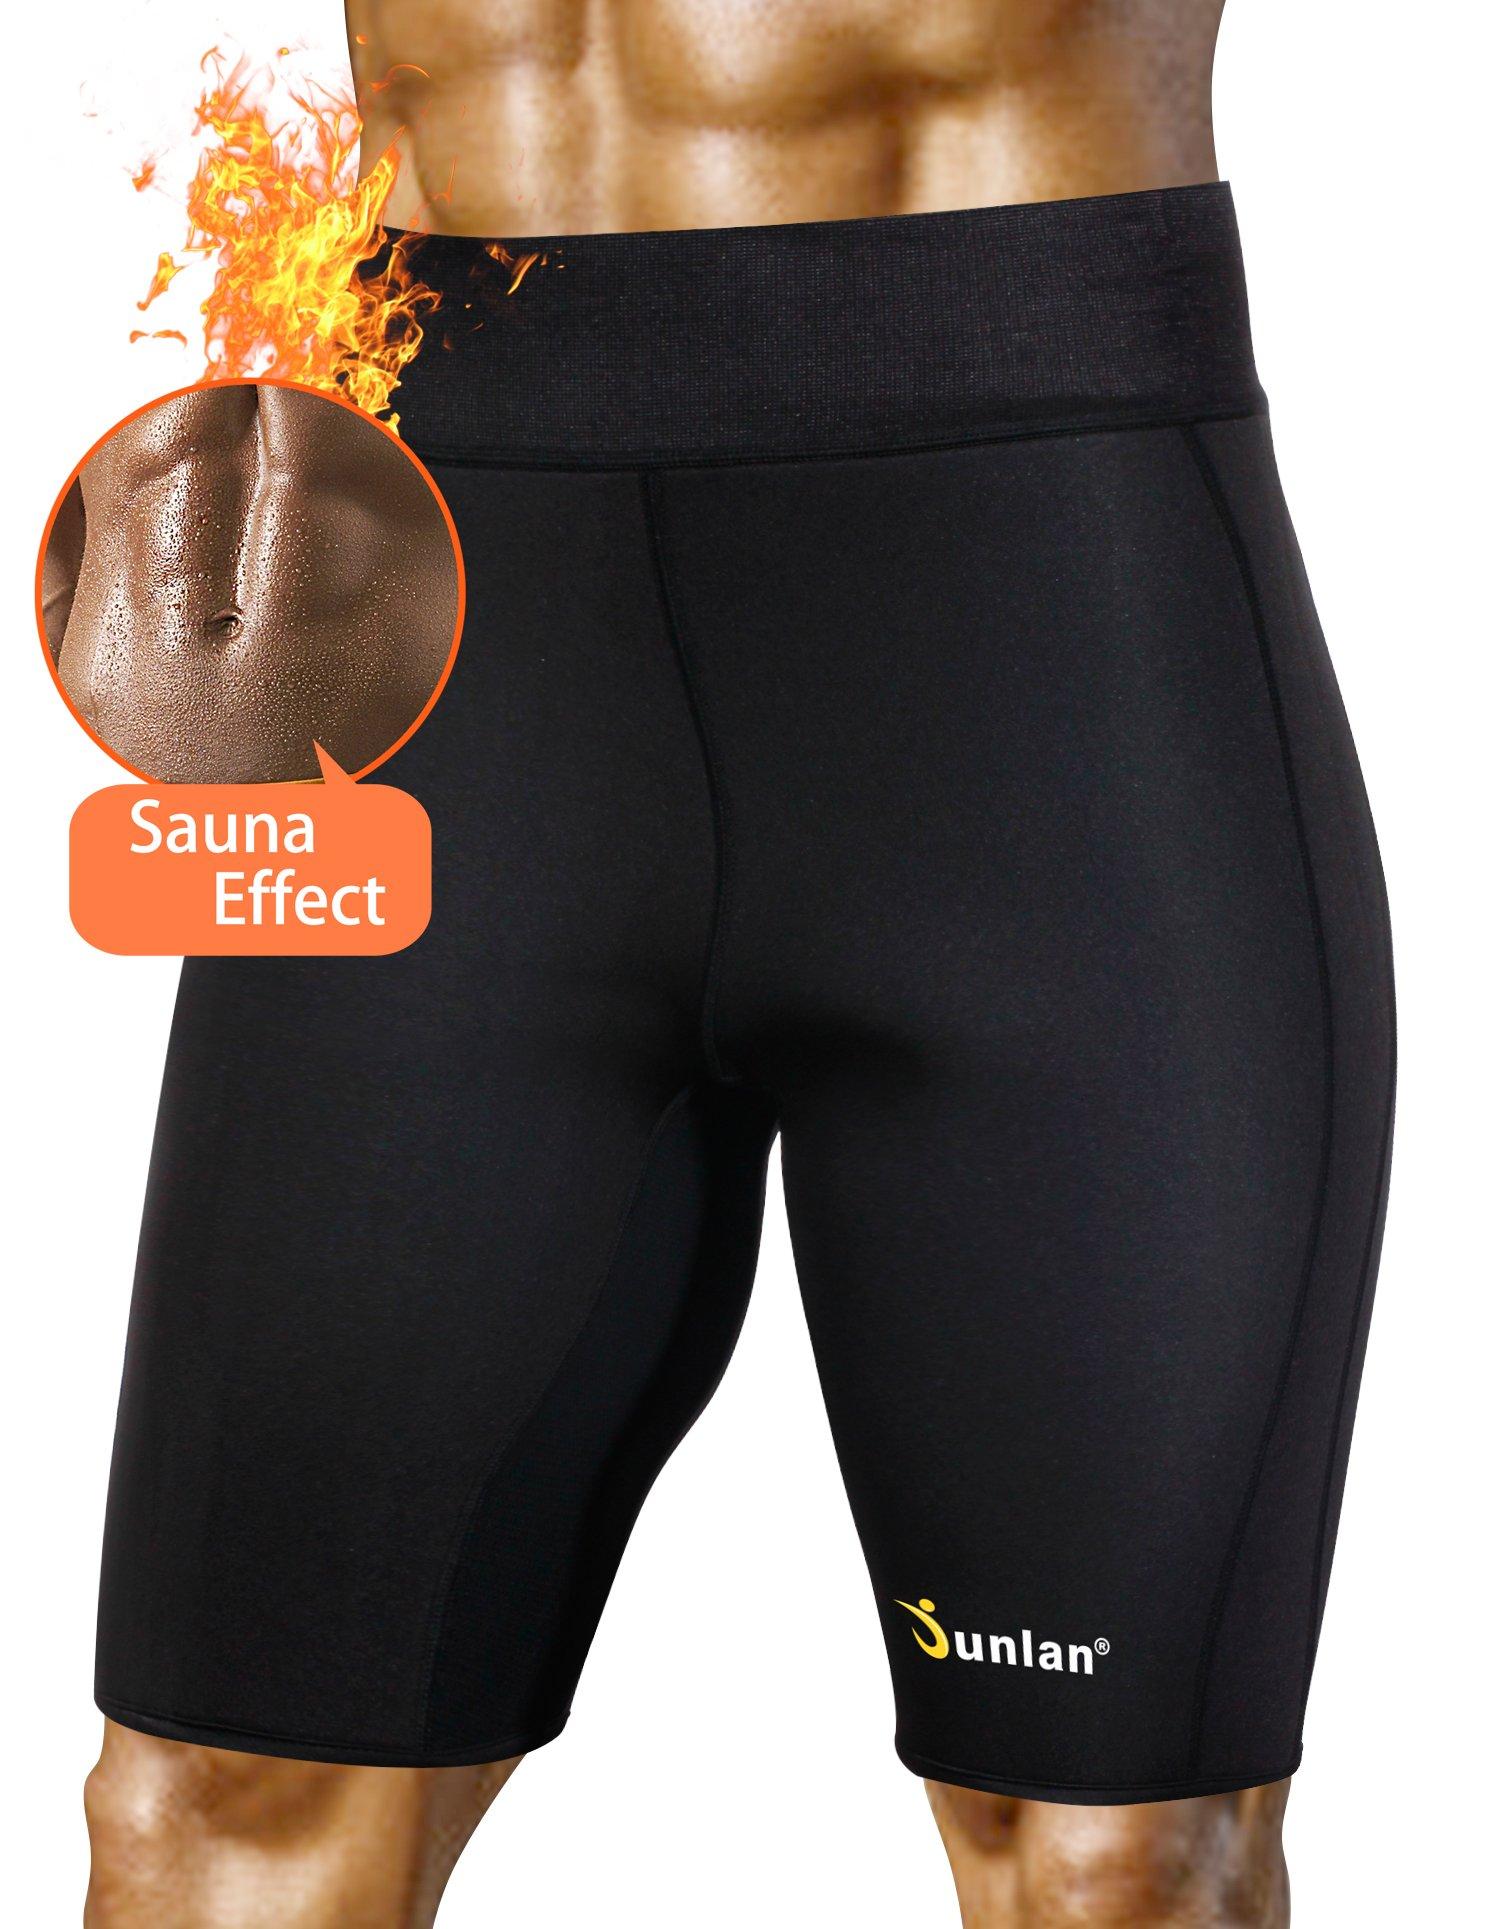 Men's Workout Sauna Hot Sweat Thermo Shorts Body Shaper Neoprene Athletic Yoga Pants Gym Tummy Slimming